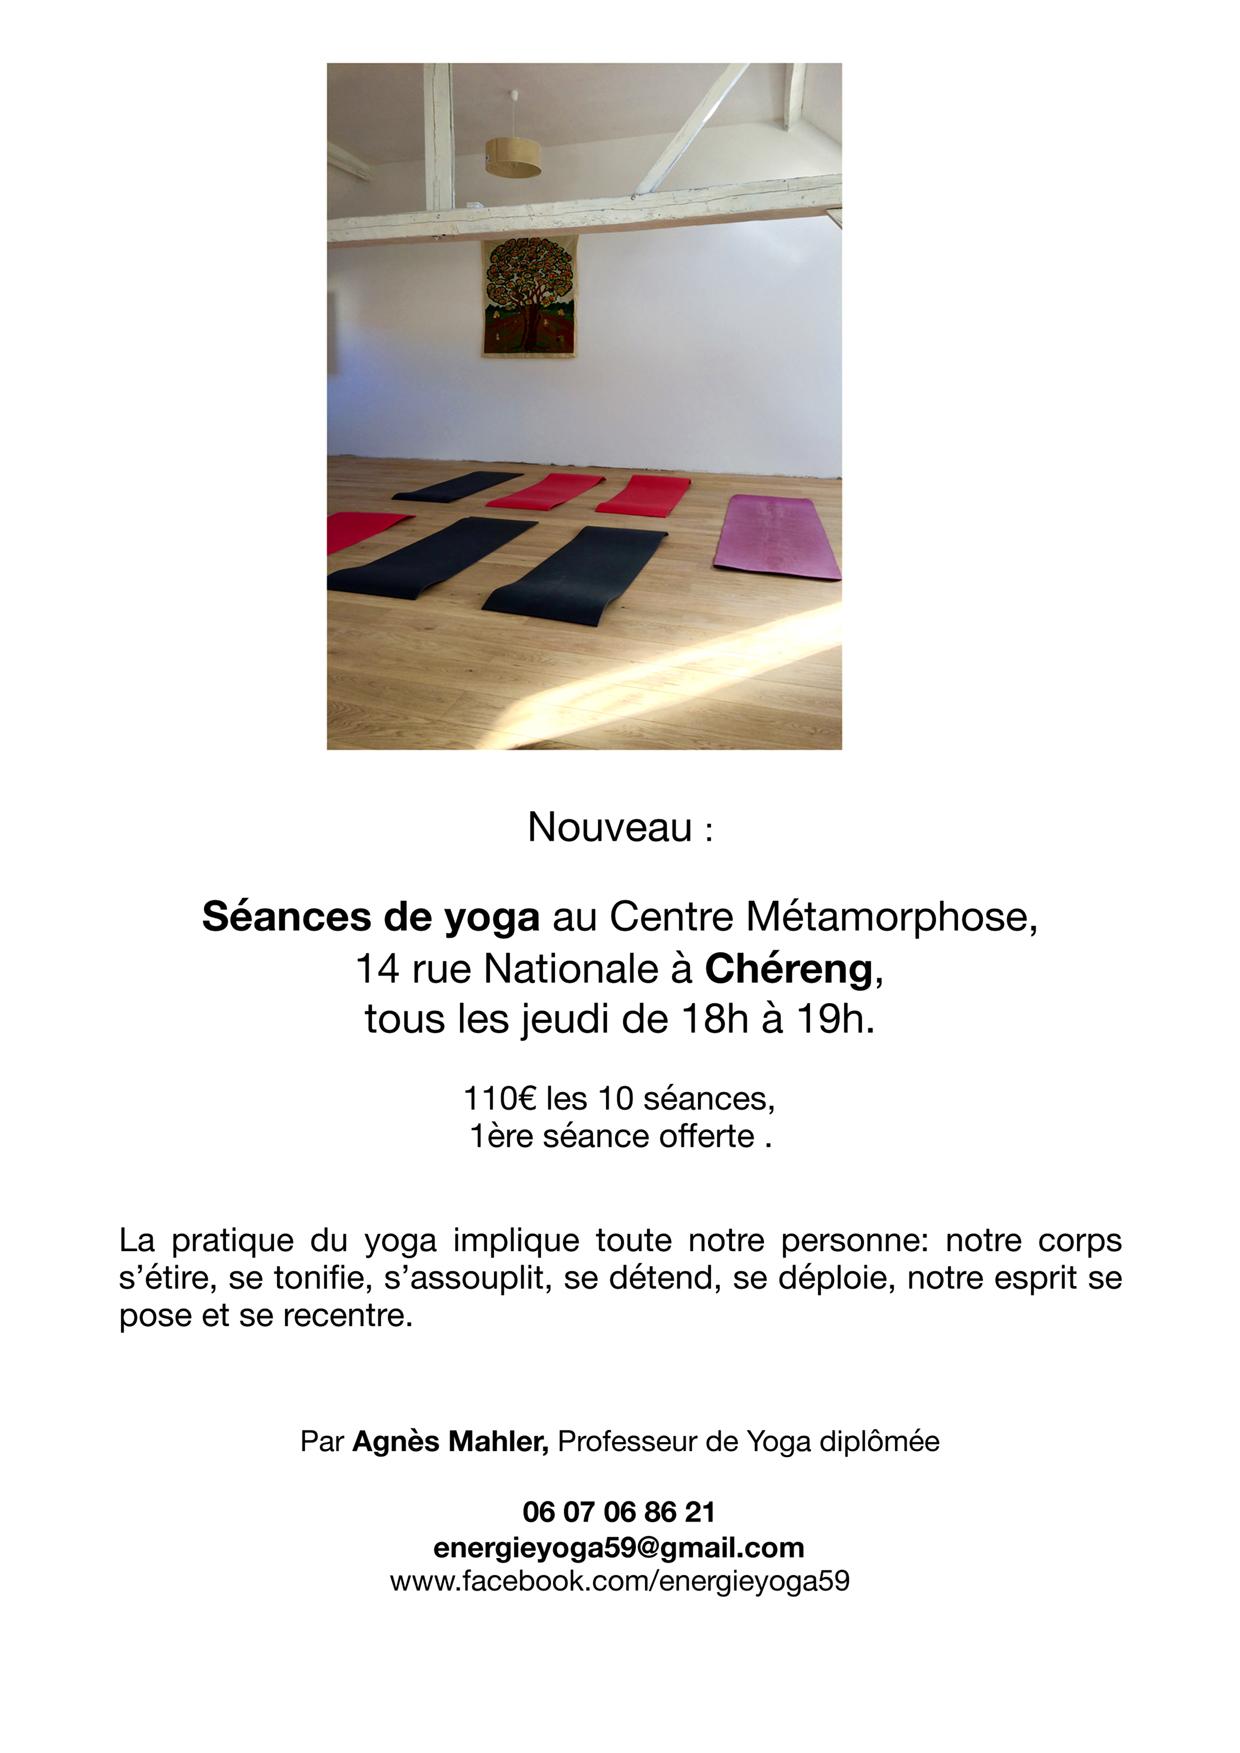 Seance de yoga chereng